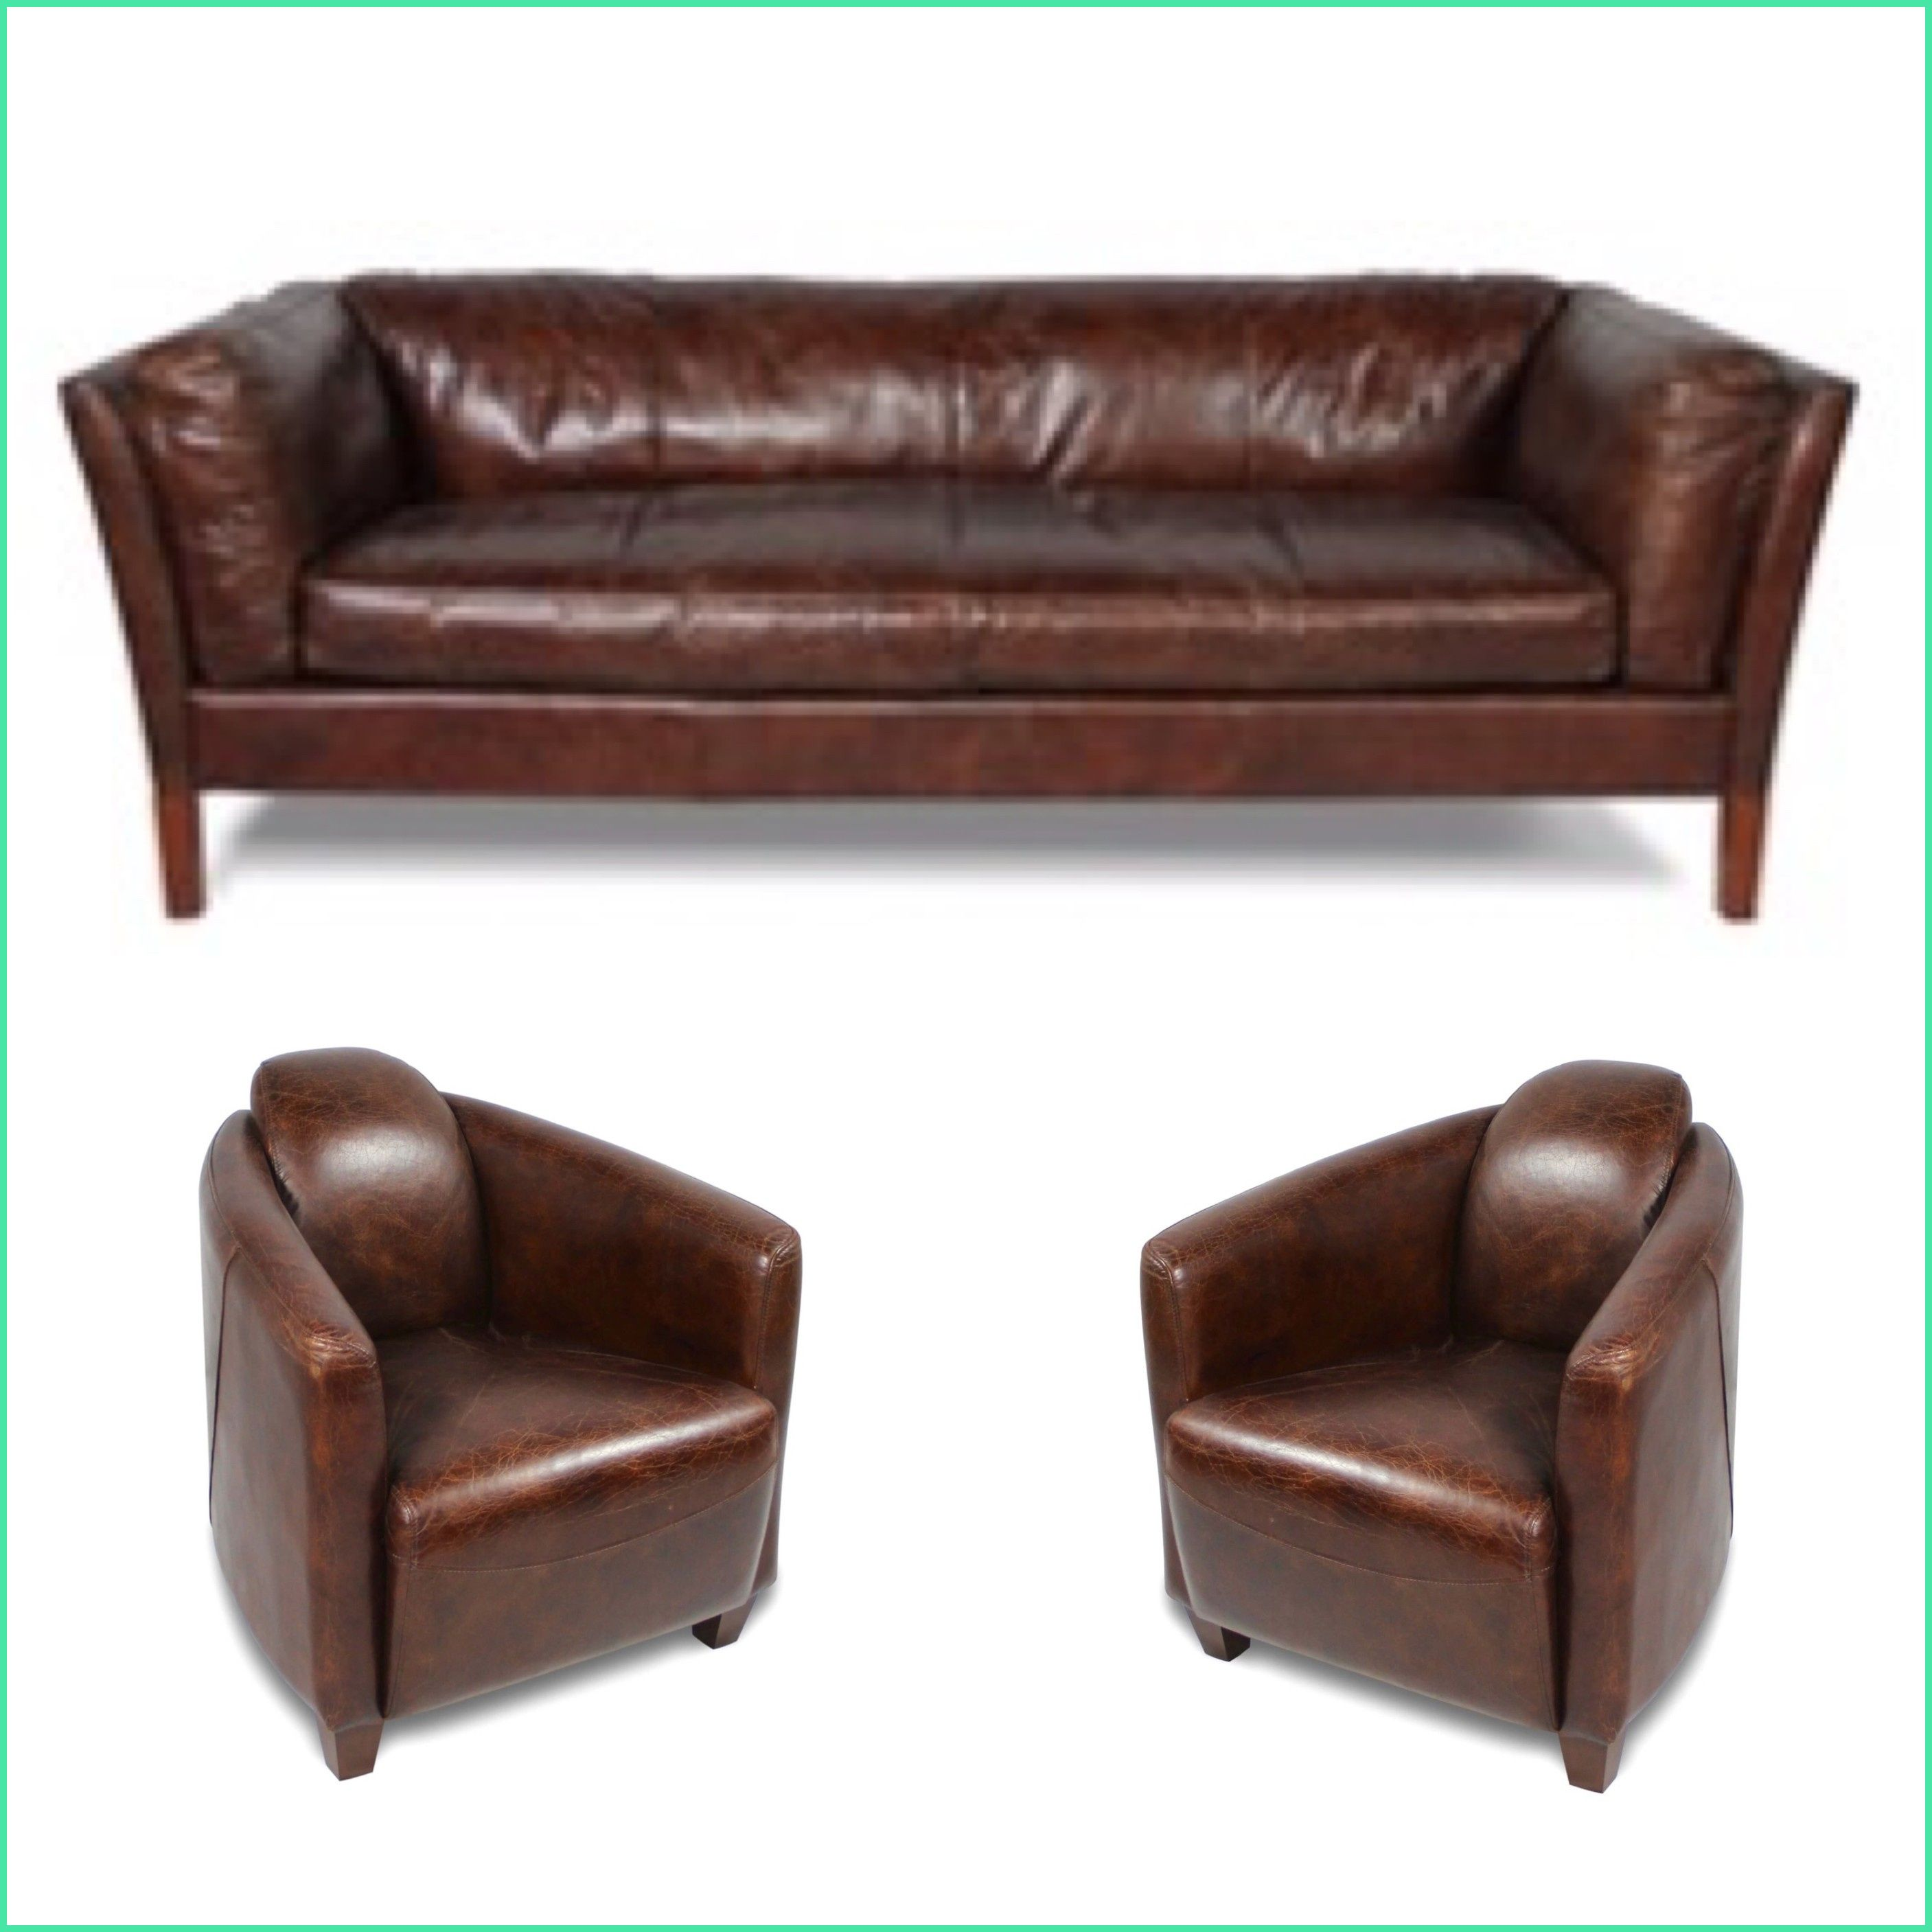 10 Authentisch Sofa Vintage Leder Decor Home Decor Home